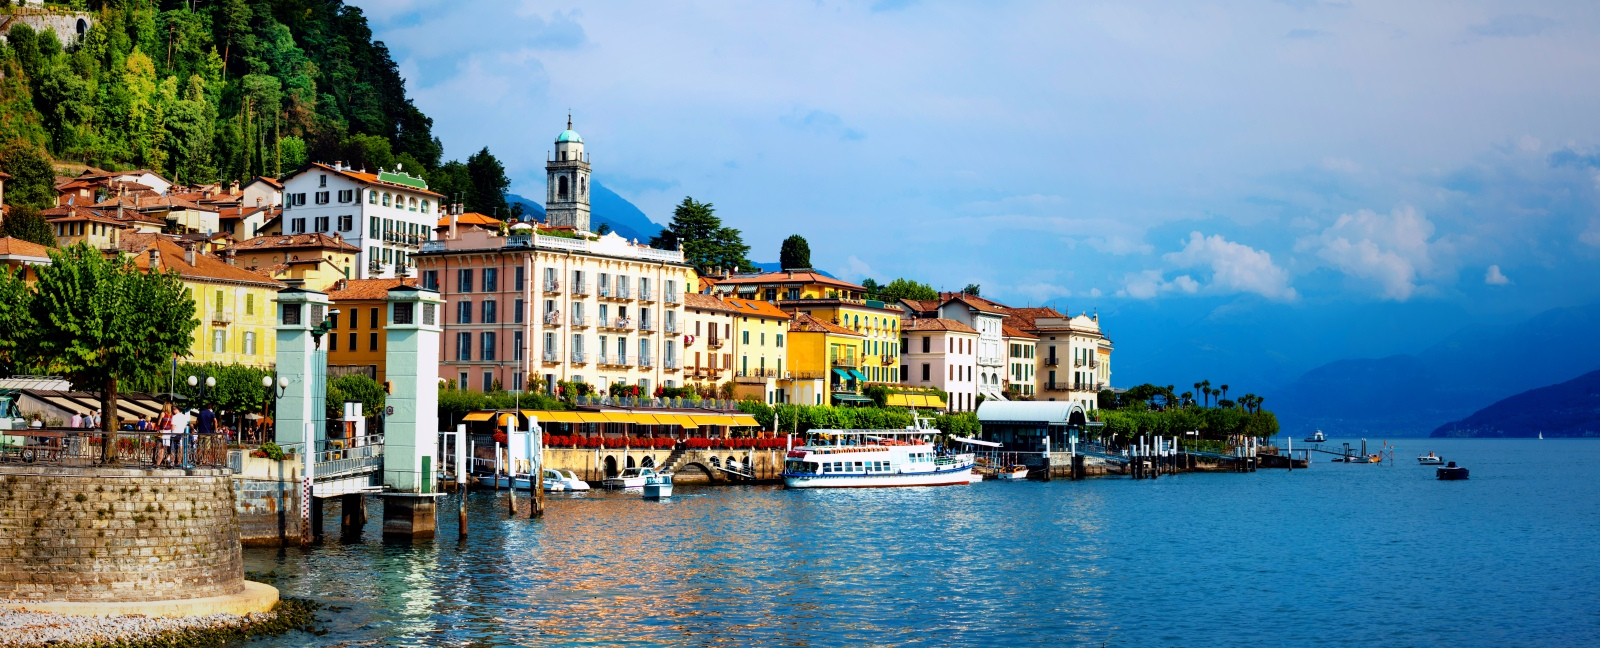 Italy's Northern Treasures